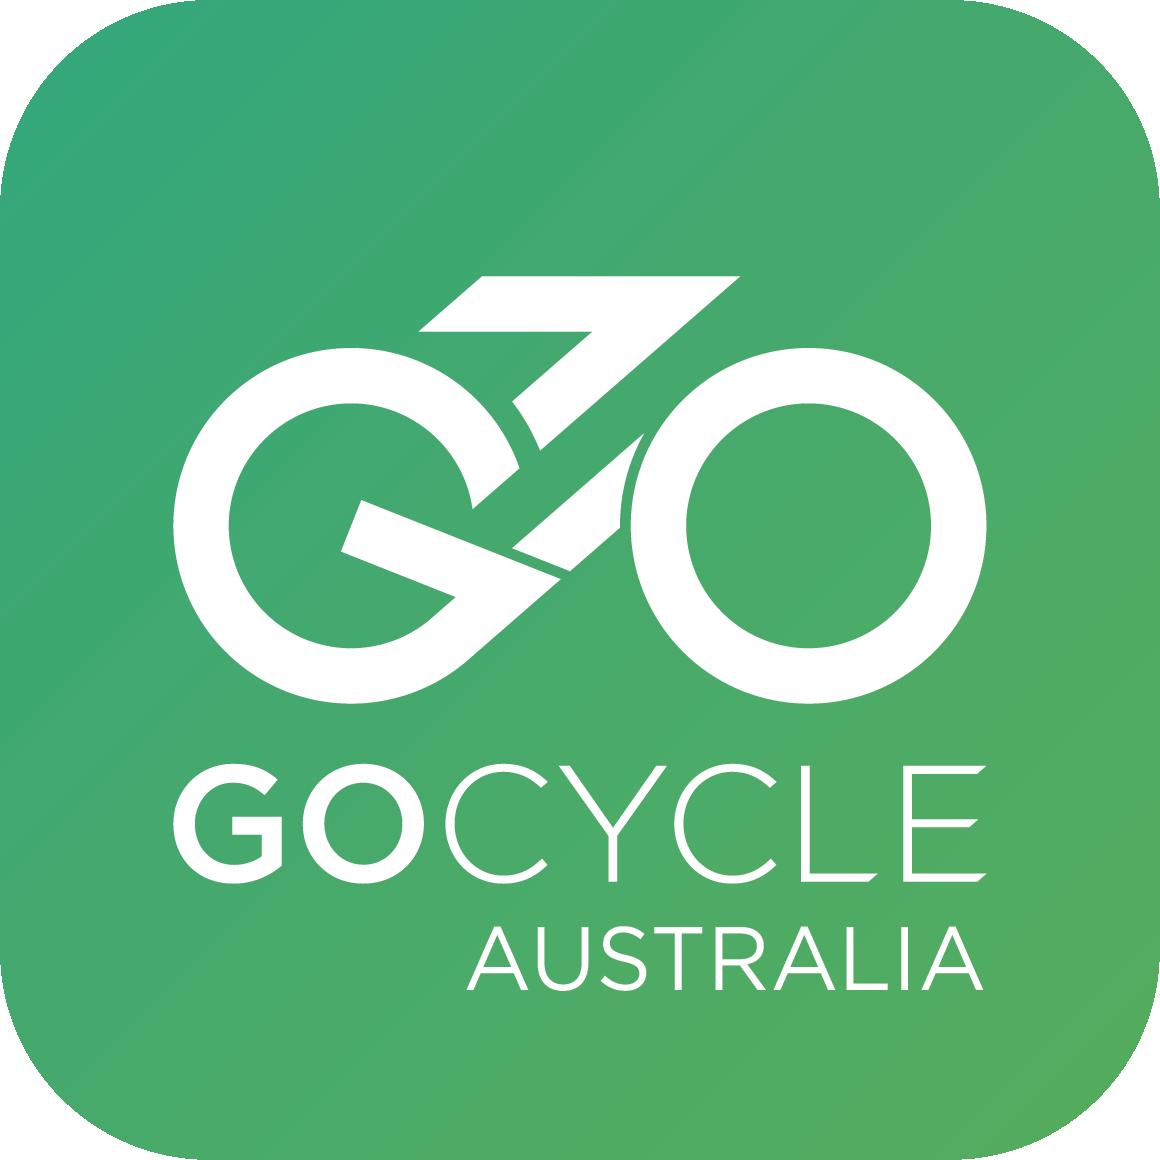 GoCycleAustralia